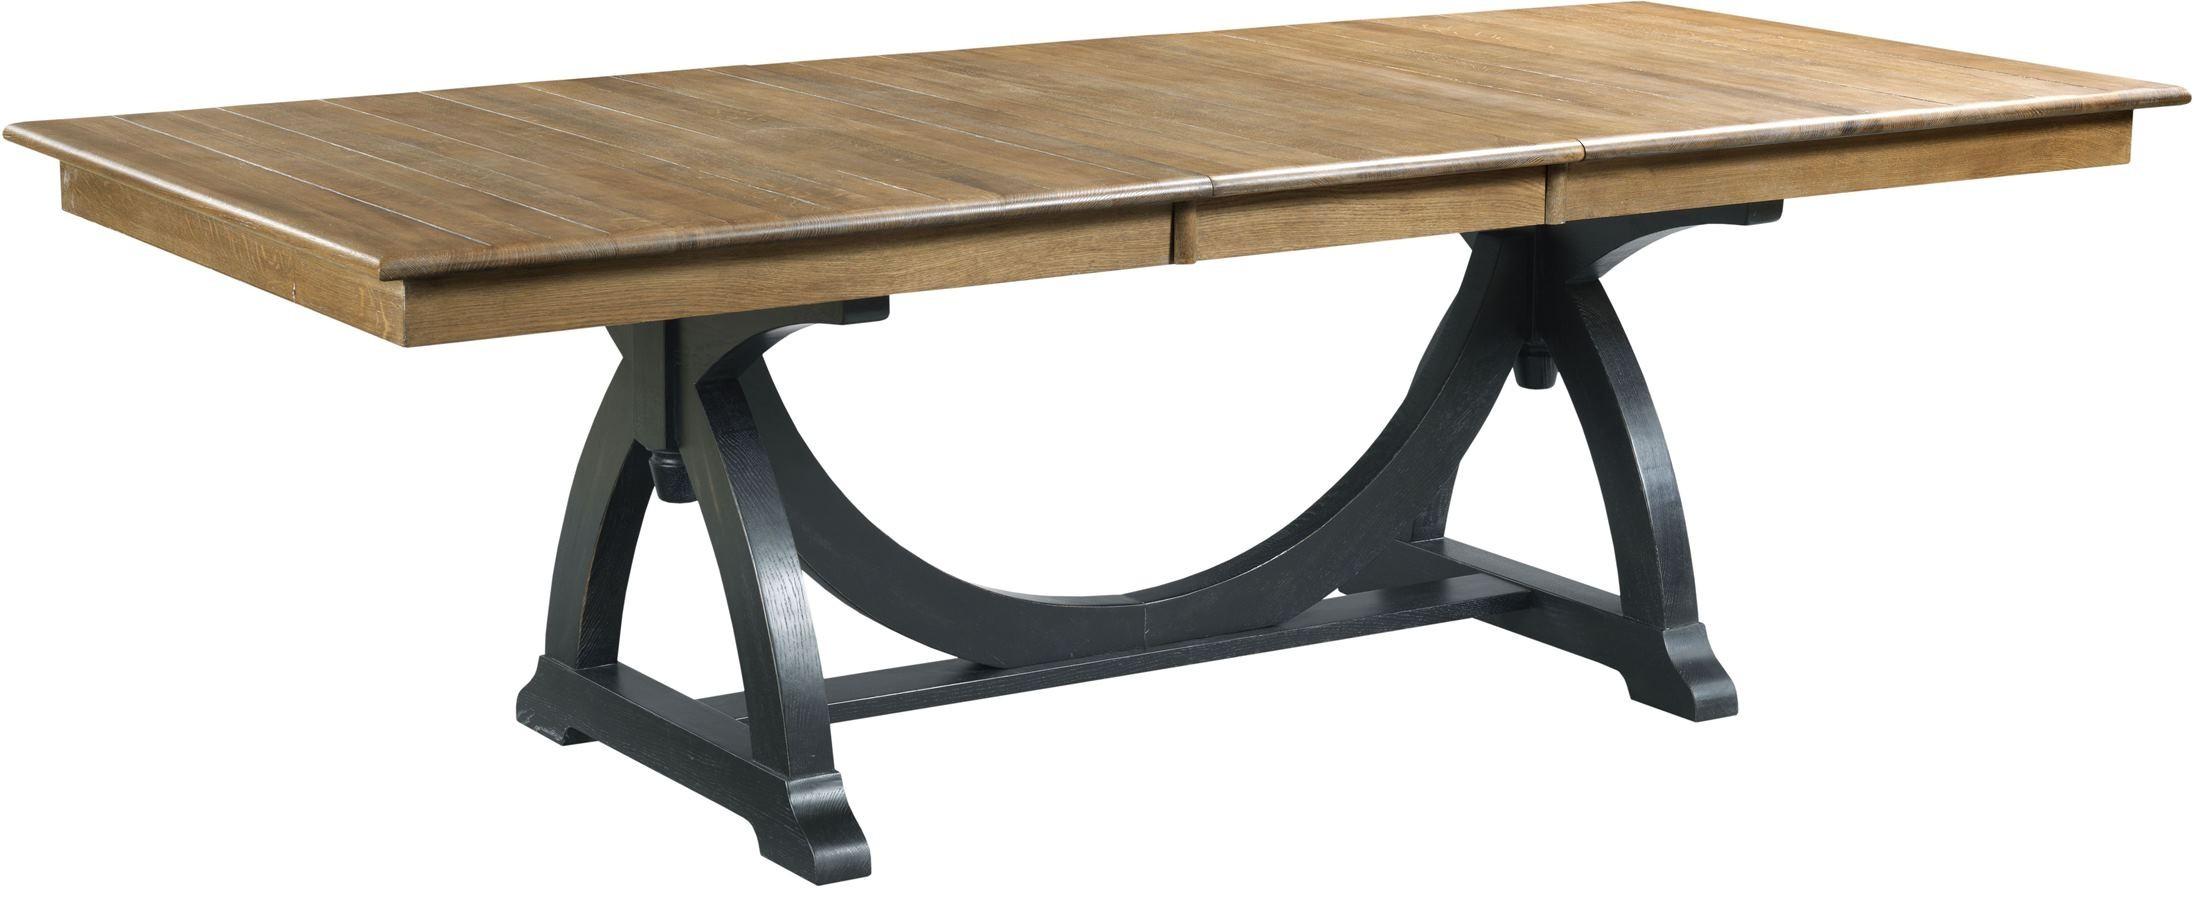 stone ridge extendable rectangular trestle dining table from kincaid 72 056p coleman furniture. Black Bedroom Furniture Sets. Home Design Ideas